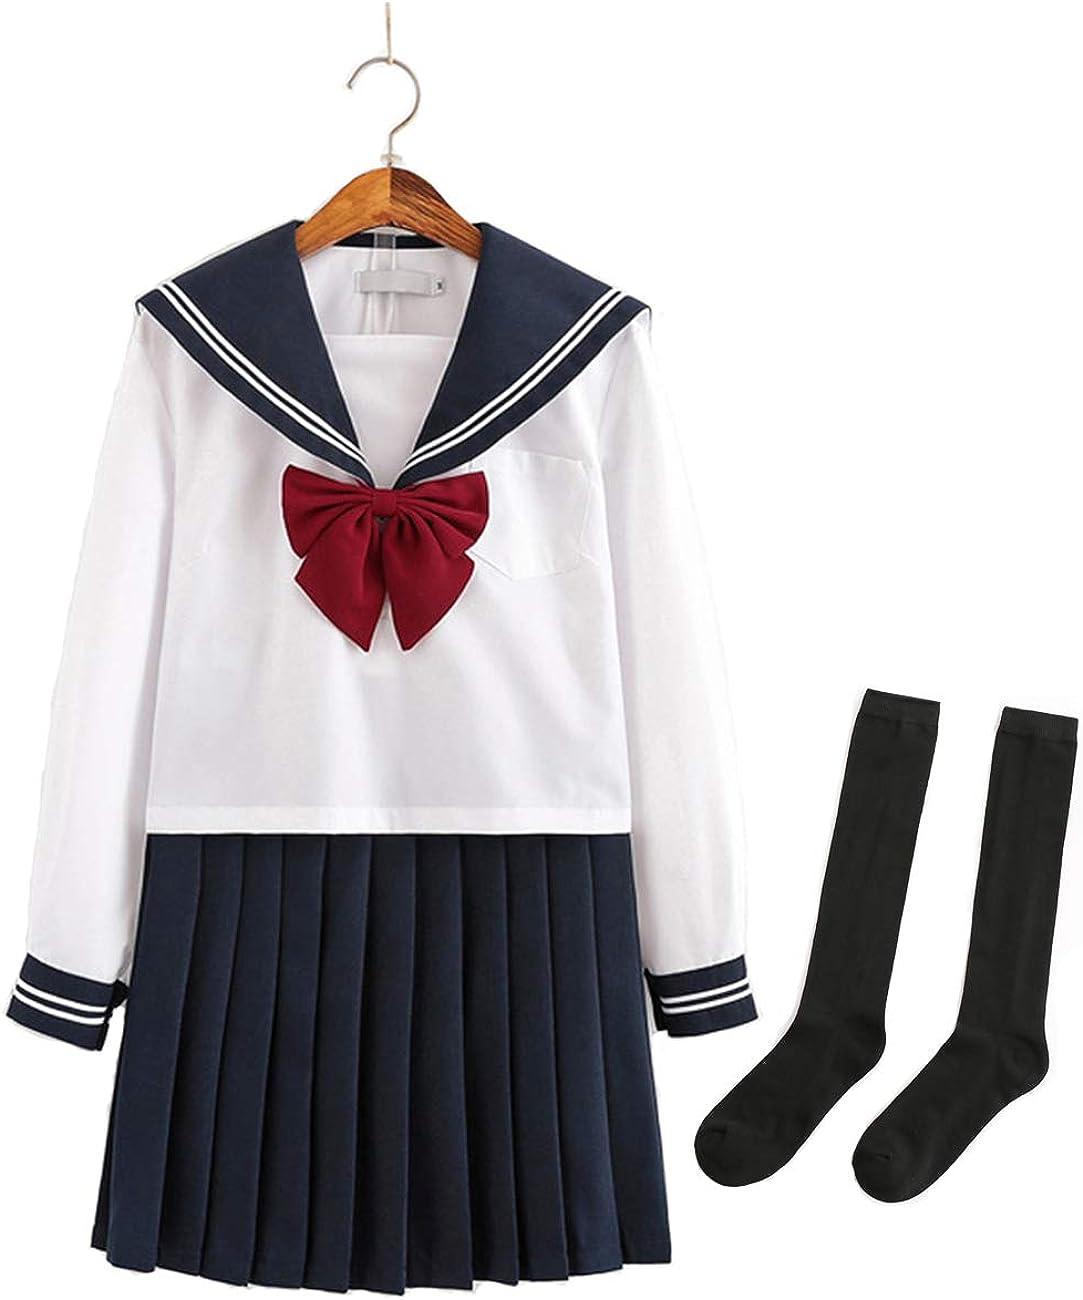 MSHDO Girl Limited time for free shipping JK Uniform Suit Suit. Student Japanese Regular store Sailor's